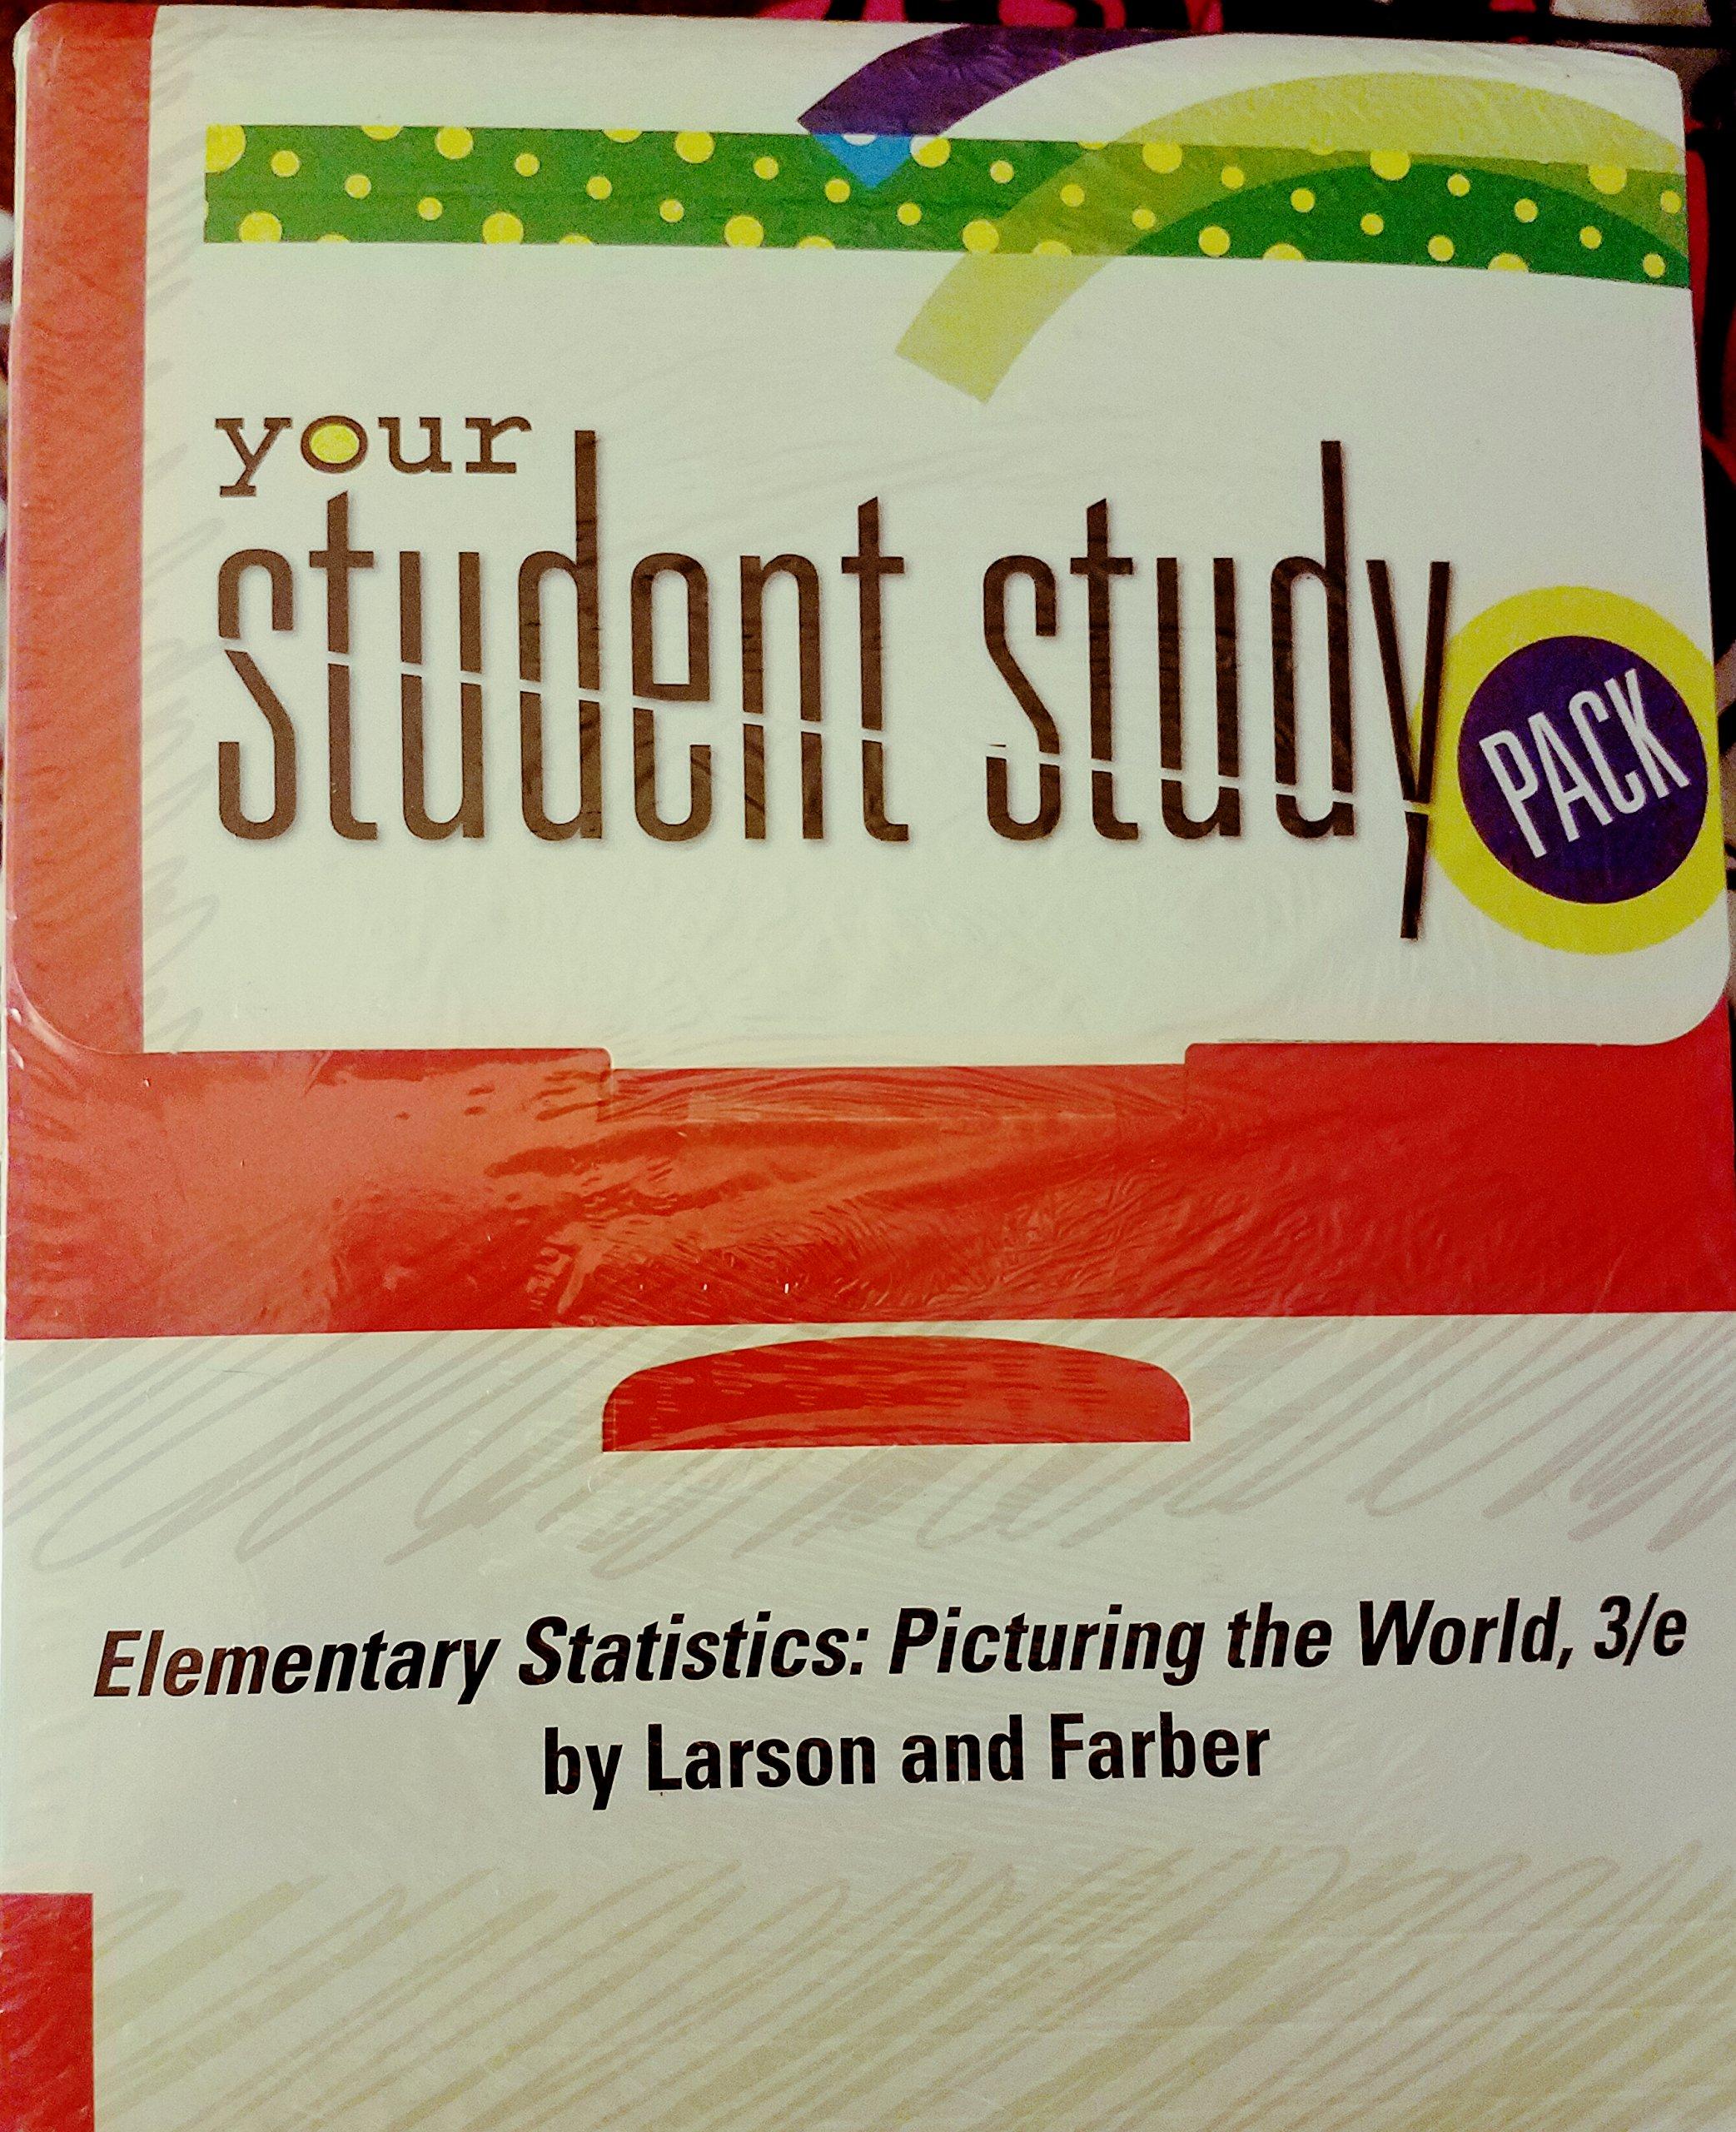 Elementary Statistics: Picturing the World-Student Study Pack: Ron Larson:  9780131343665: Amazon.com: Books